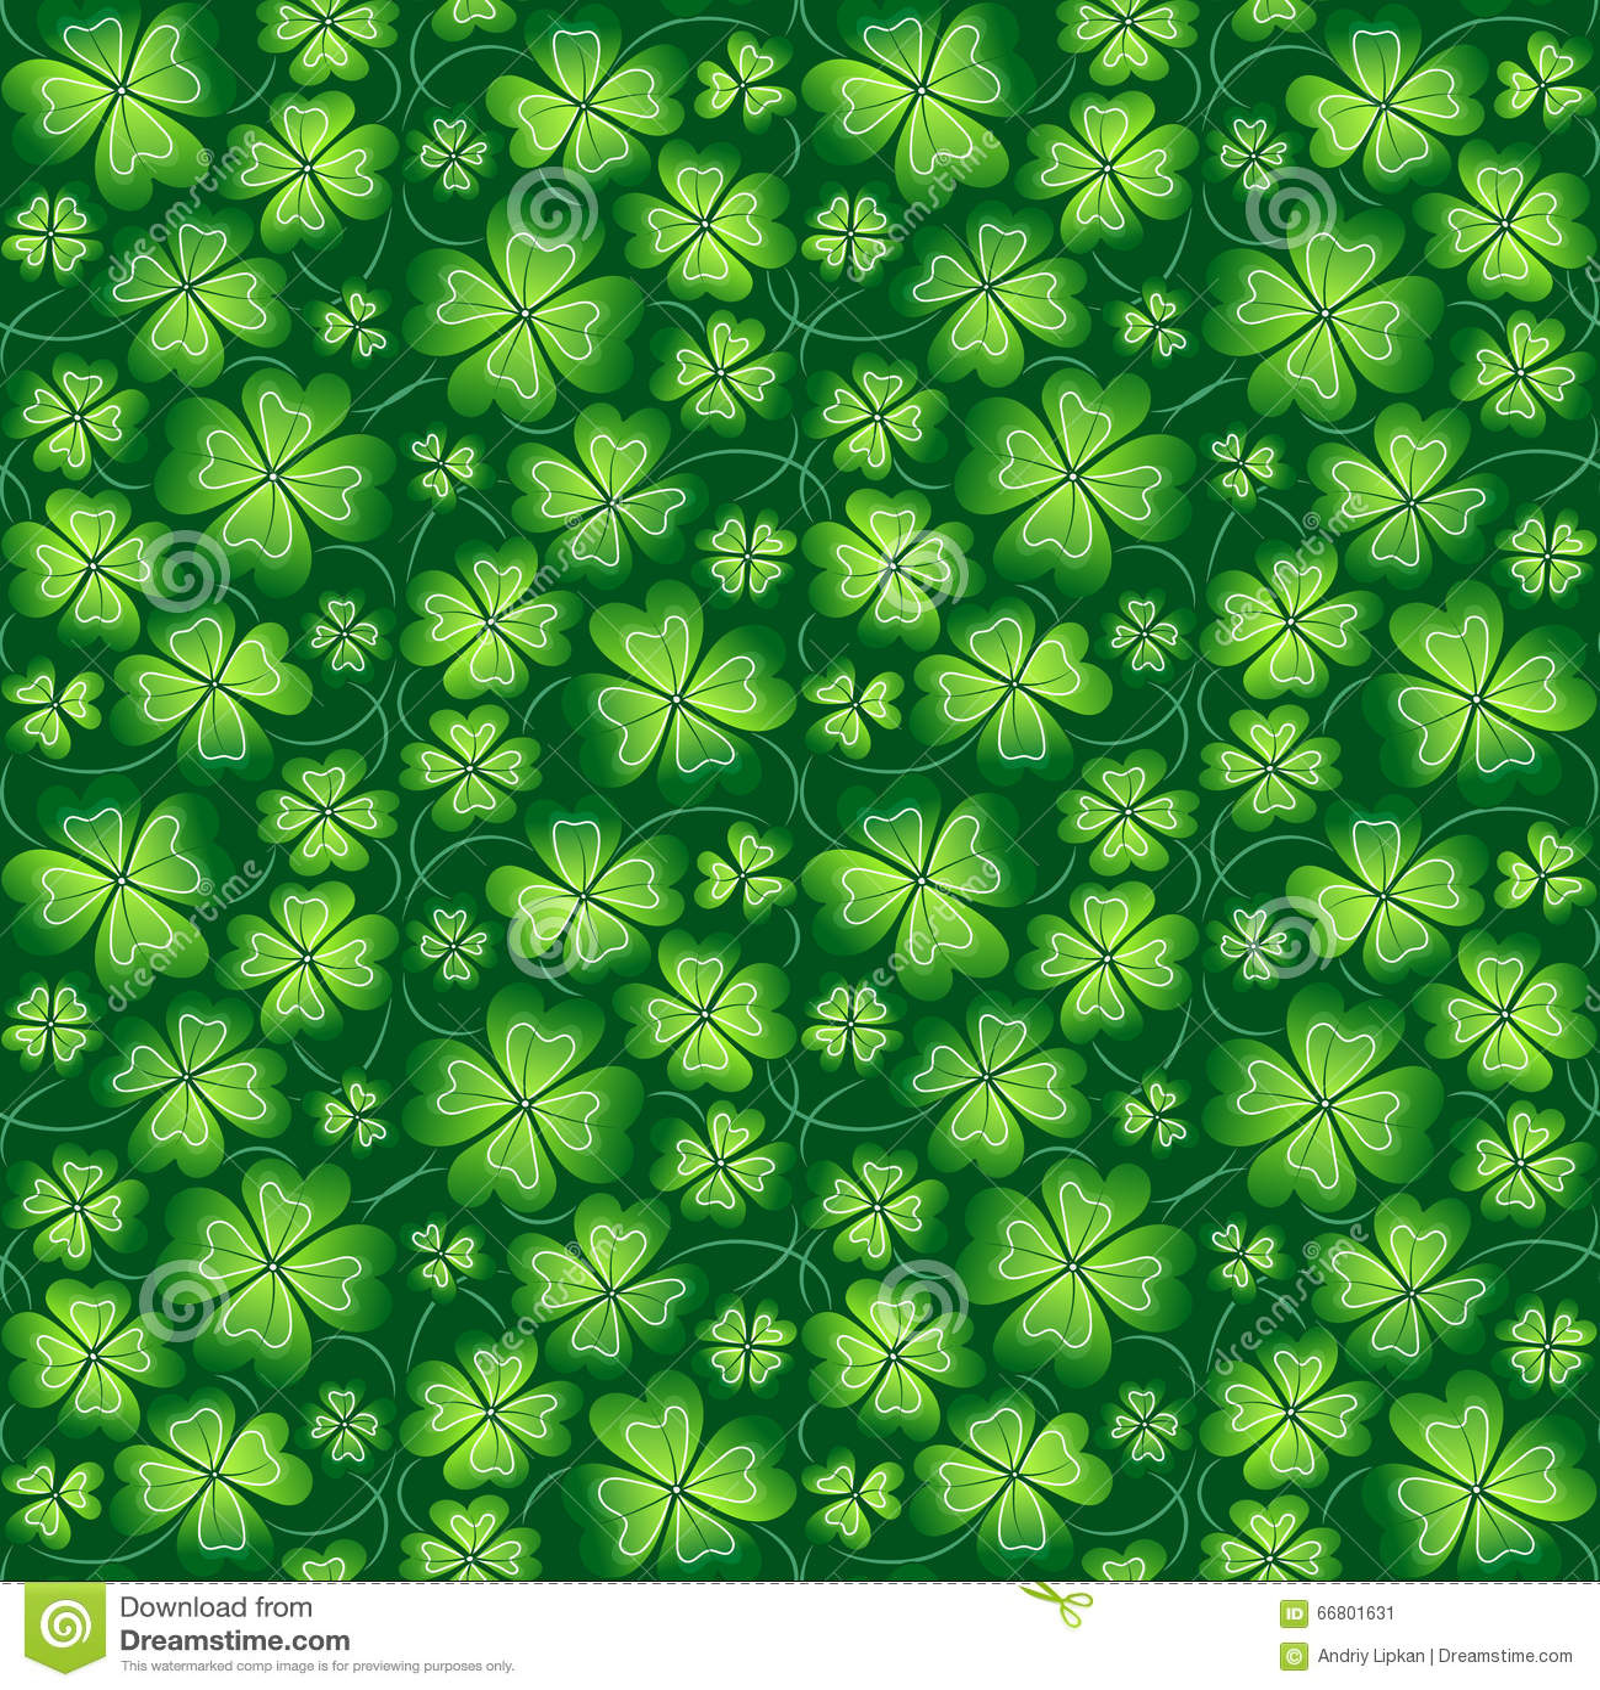 Luck Leaf 4 Clover Good